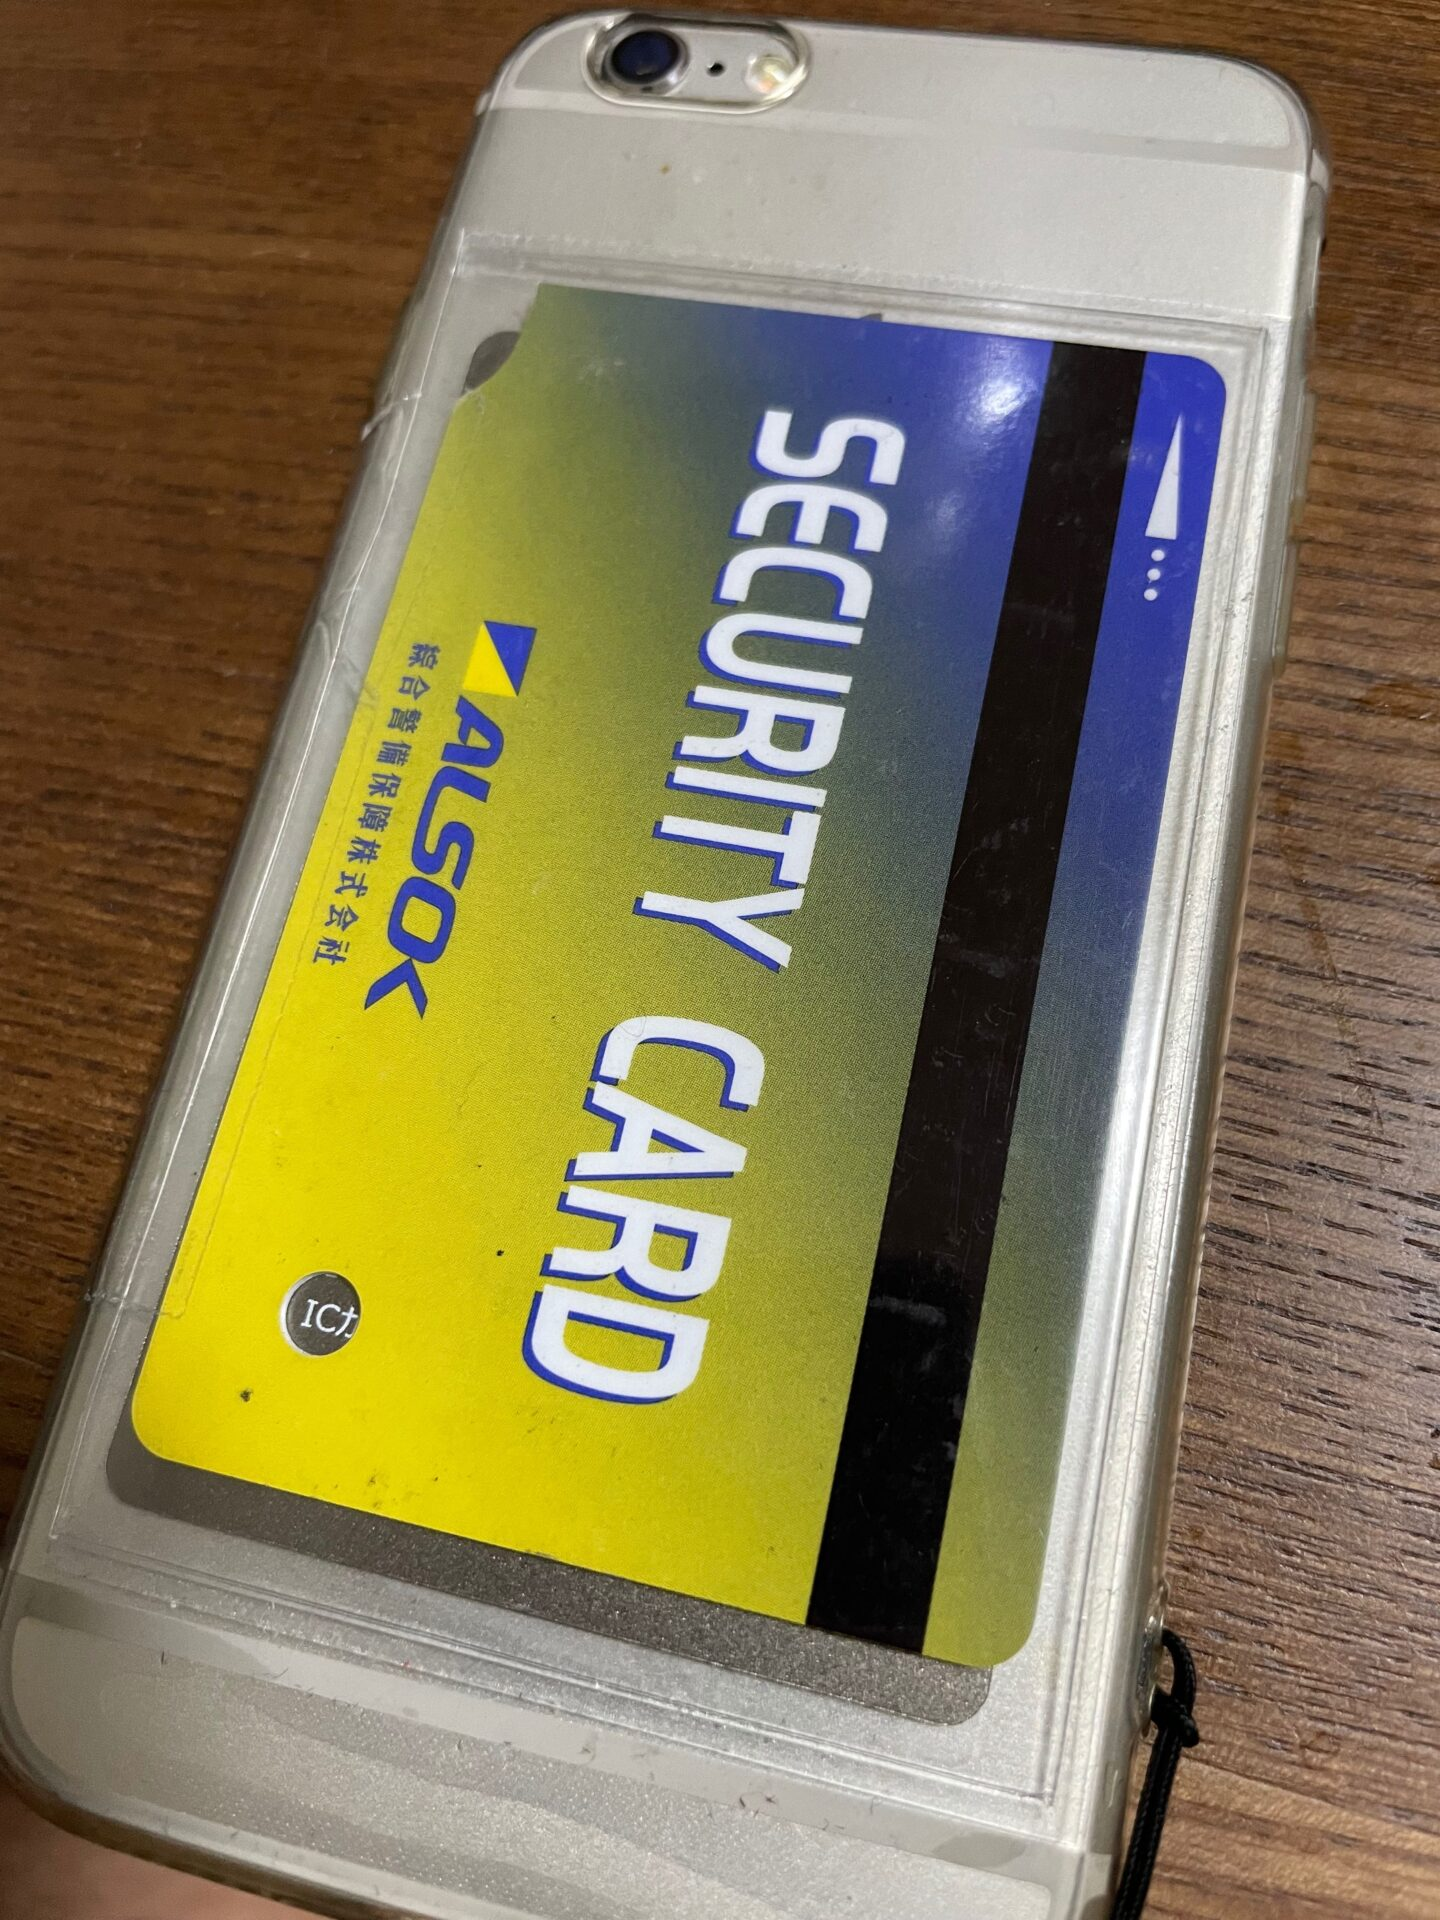 Intii 電磁波干渉防止シート スマホ専用 ICカード読み取りエラー防止シート 改札 磁気防止 超薄 (3枚セット) iPhone